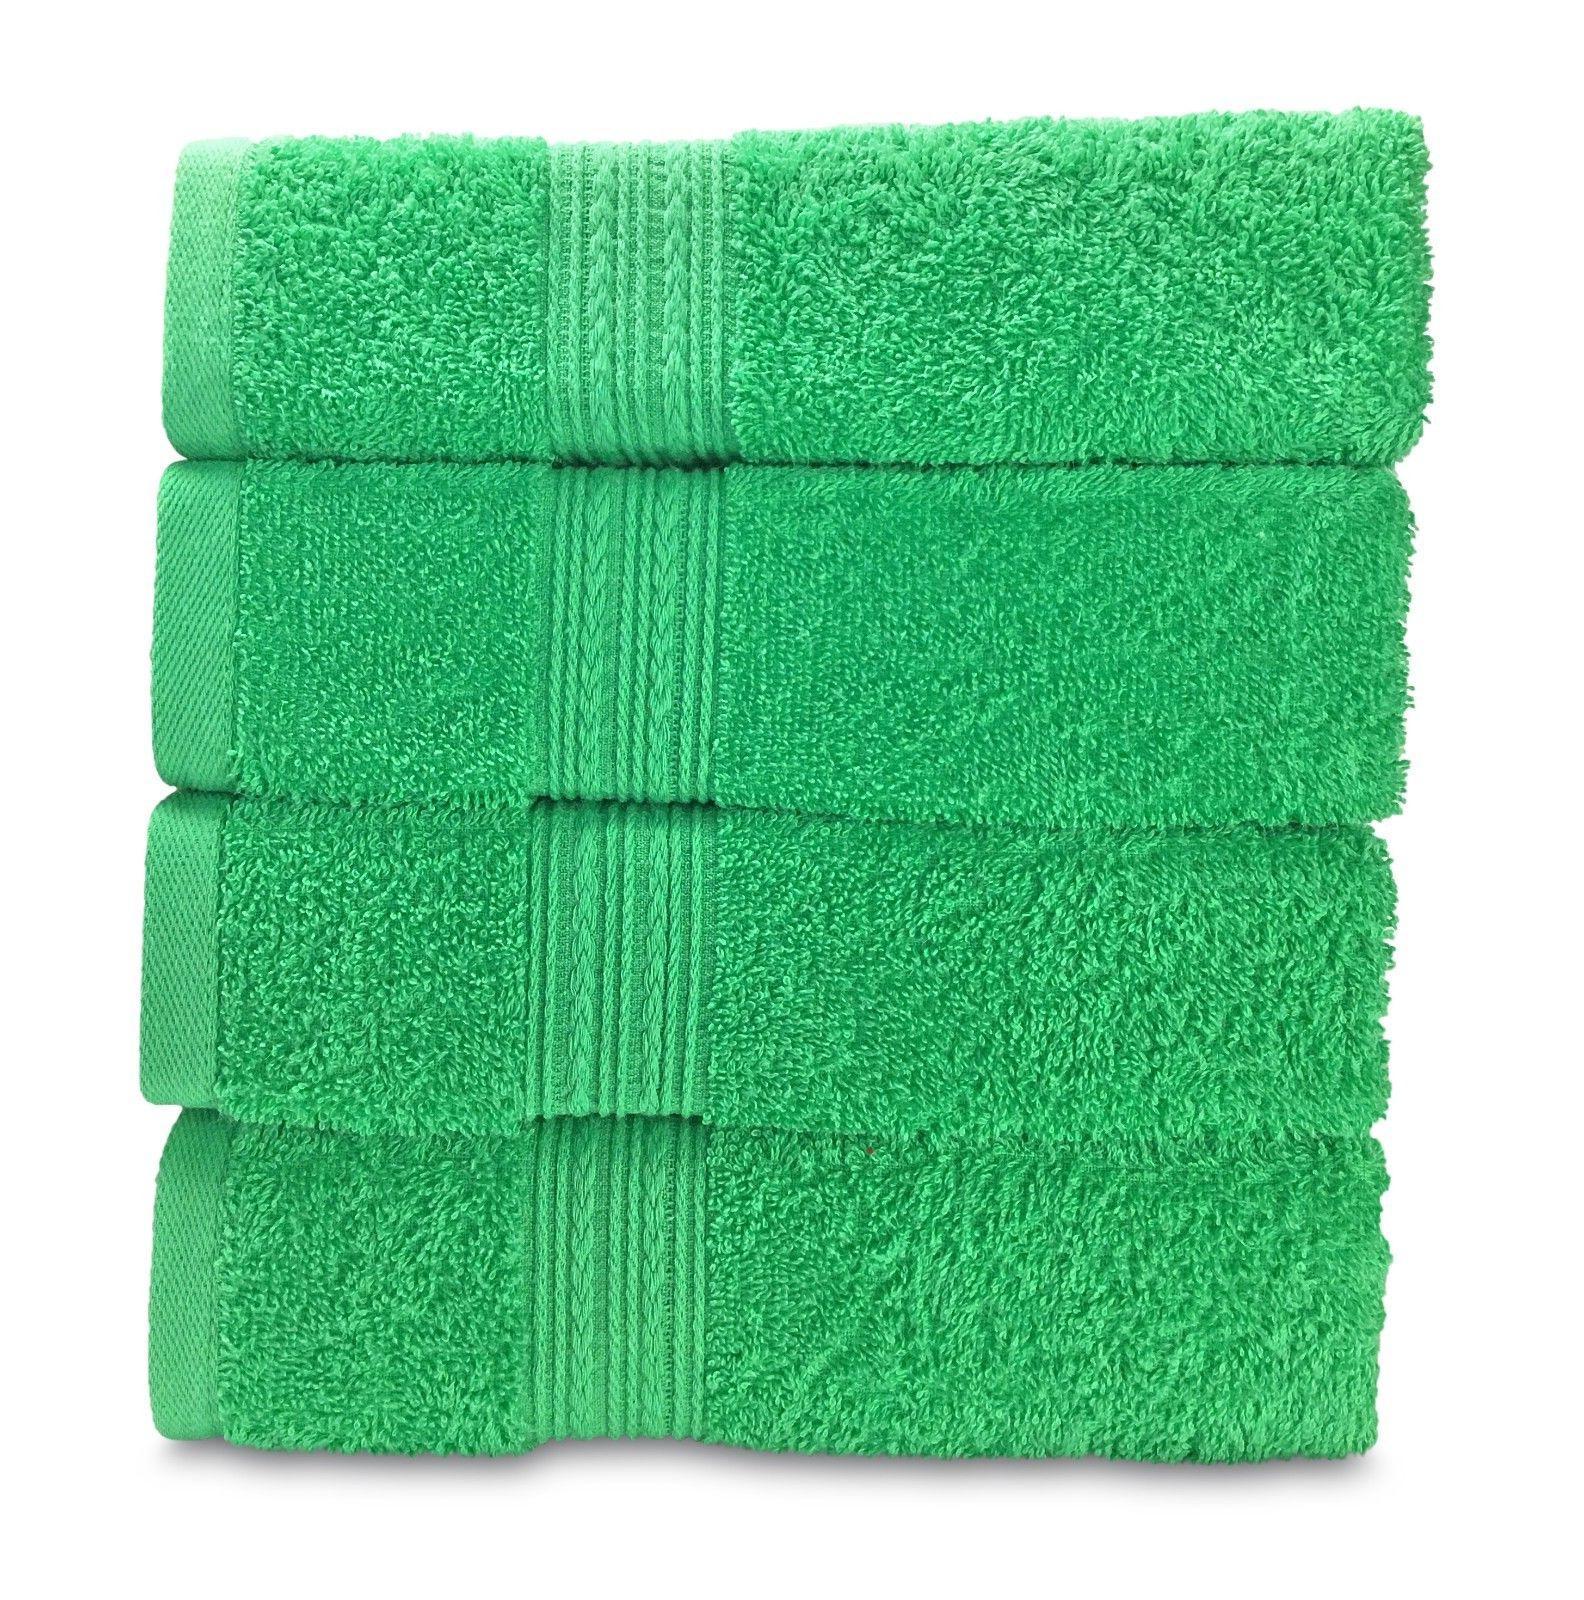 Goza Cotton Hand Bath, Home, Gym, -16x28 4